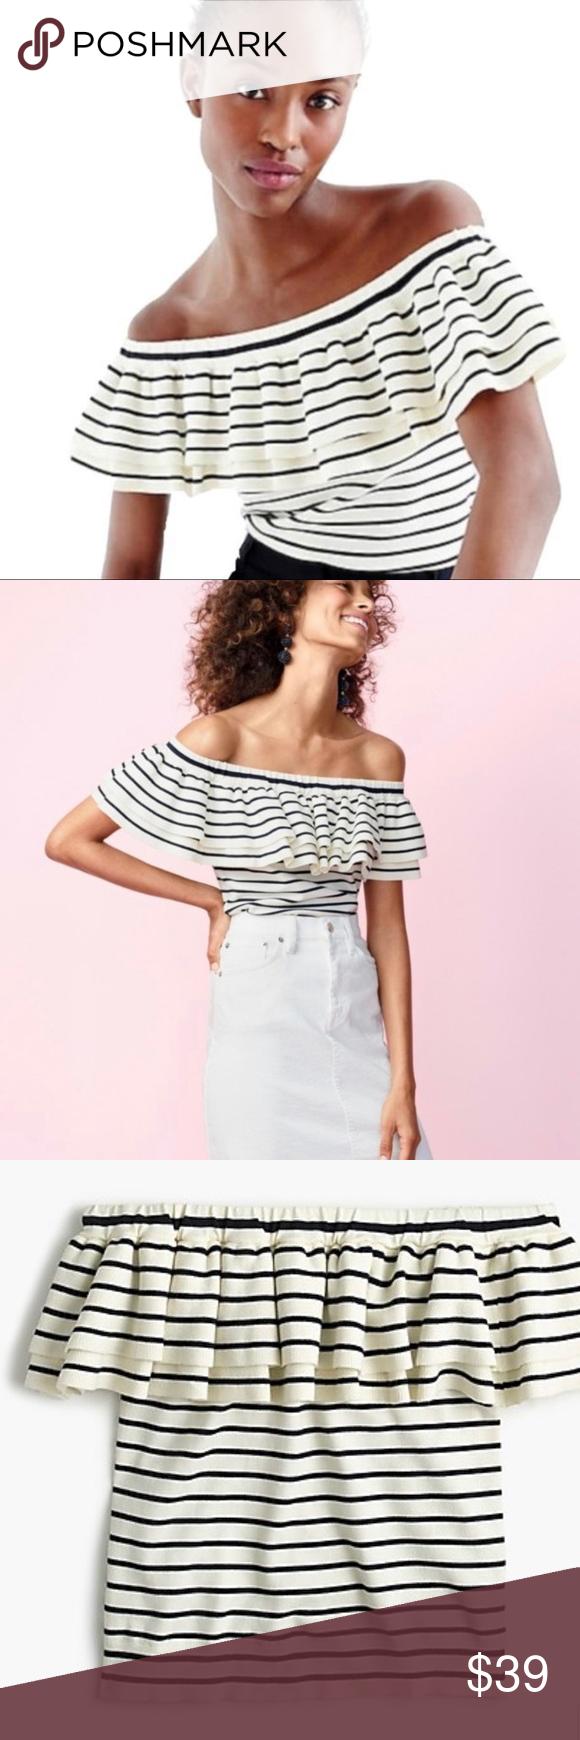 Women/'s Ruffle Trim Shell Cream//Black Stripe Top by Who What Wear